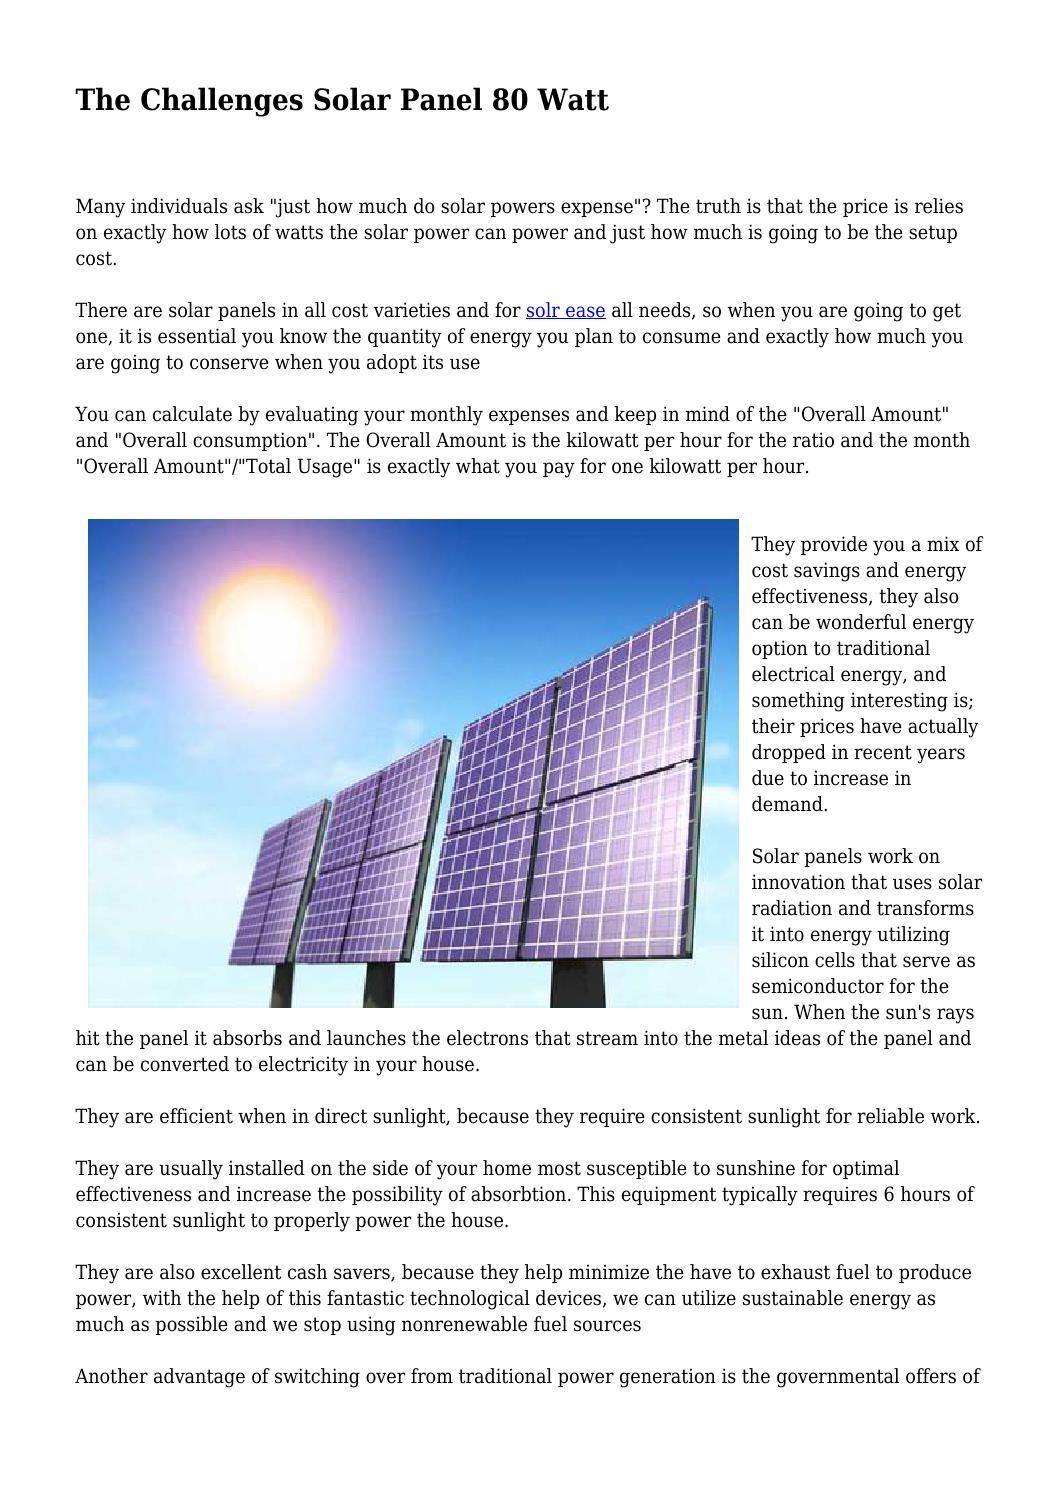 The Challenges Solar Panel 80 Watt by dqrrellvqnnv - issuu